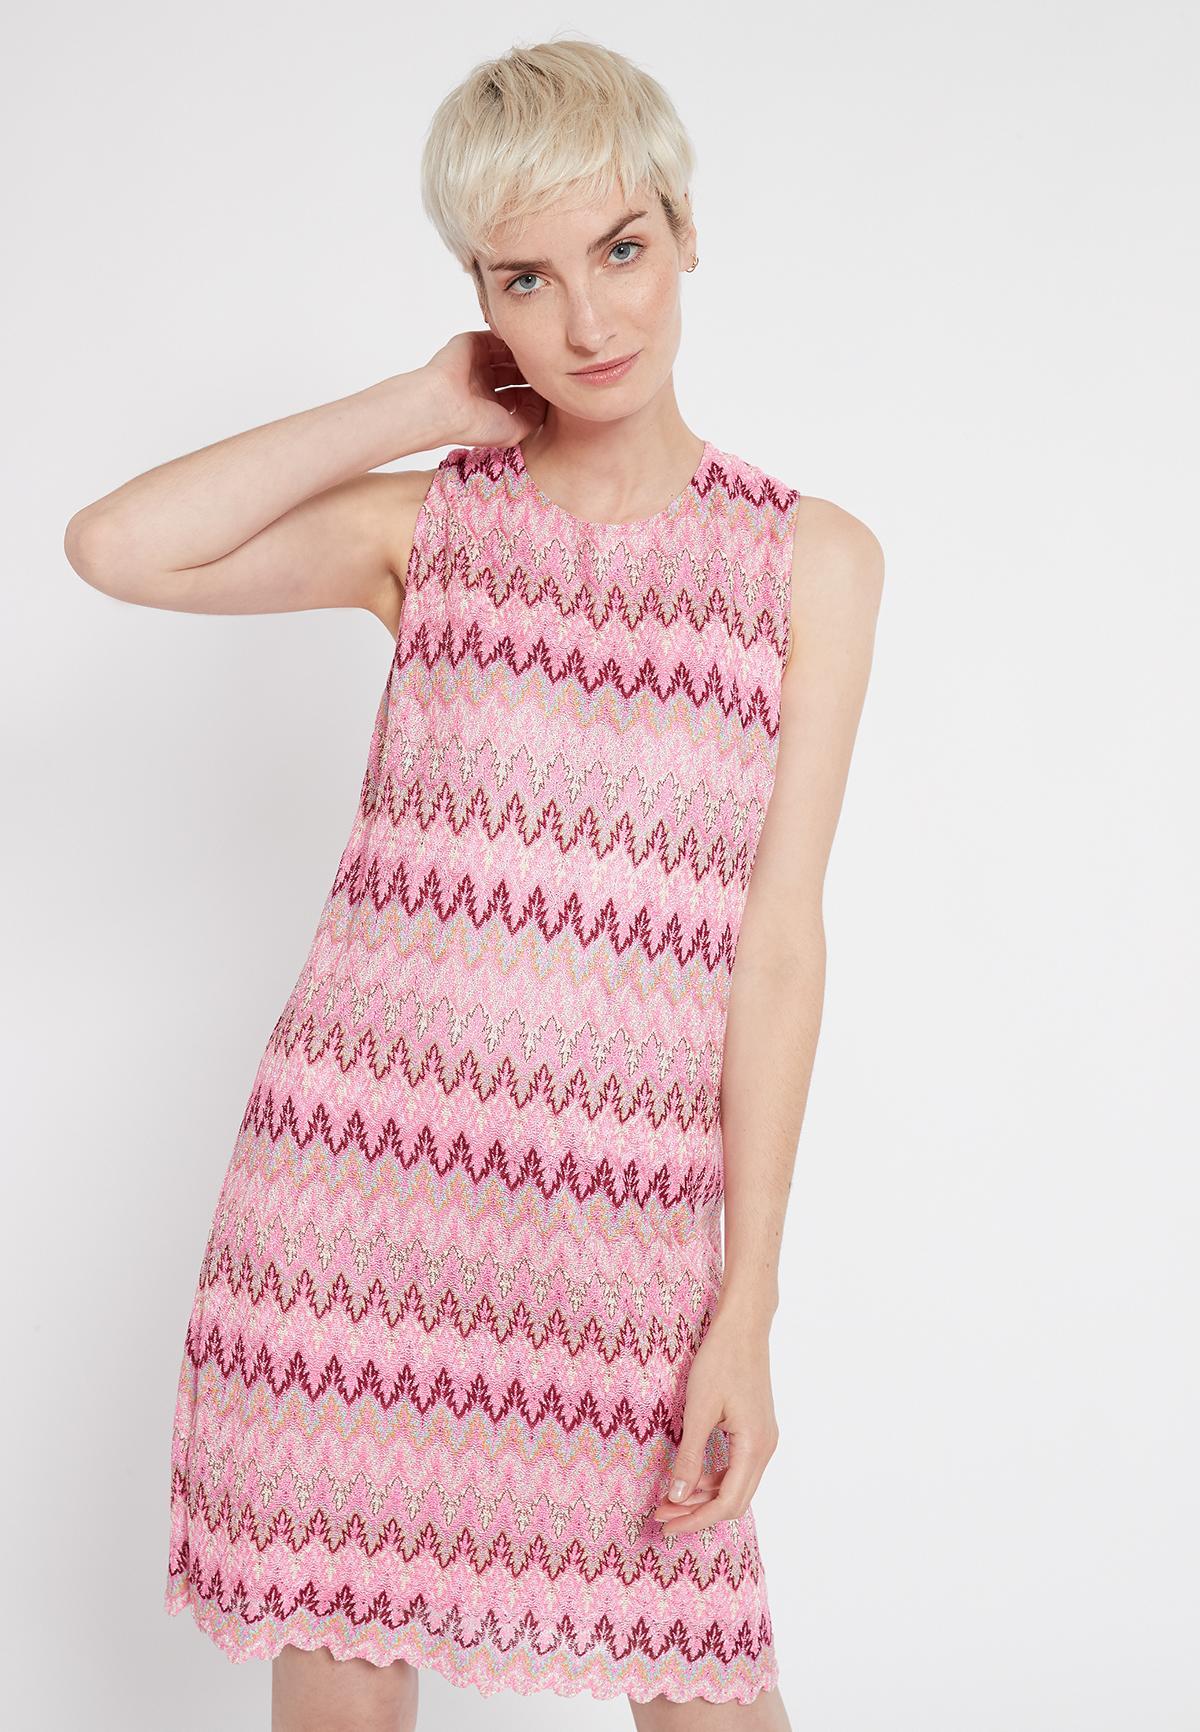 Ärmelloses Minikleid Sobly aus rosa Zick-Zack Strick | Ana ...